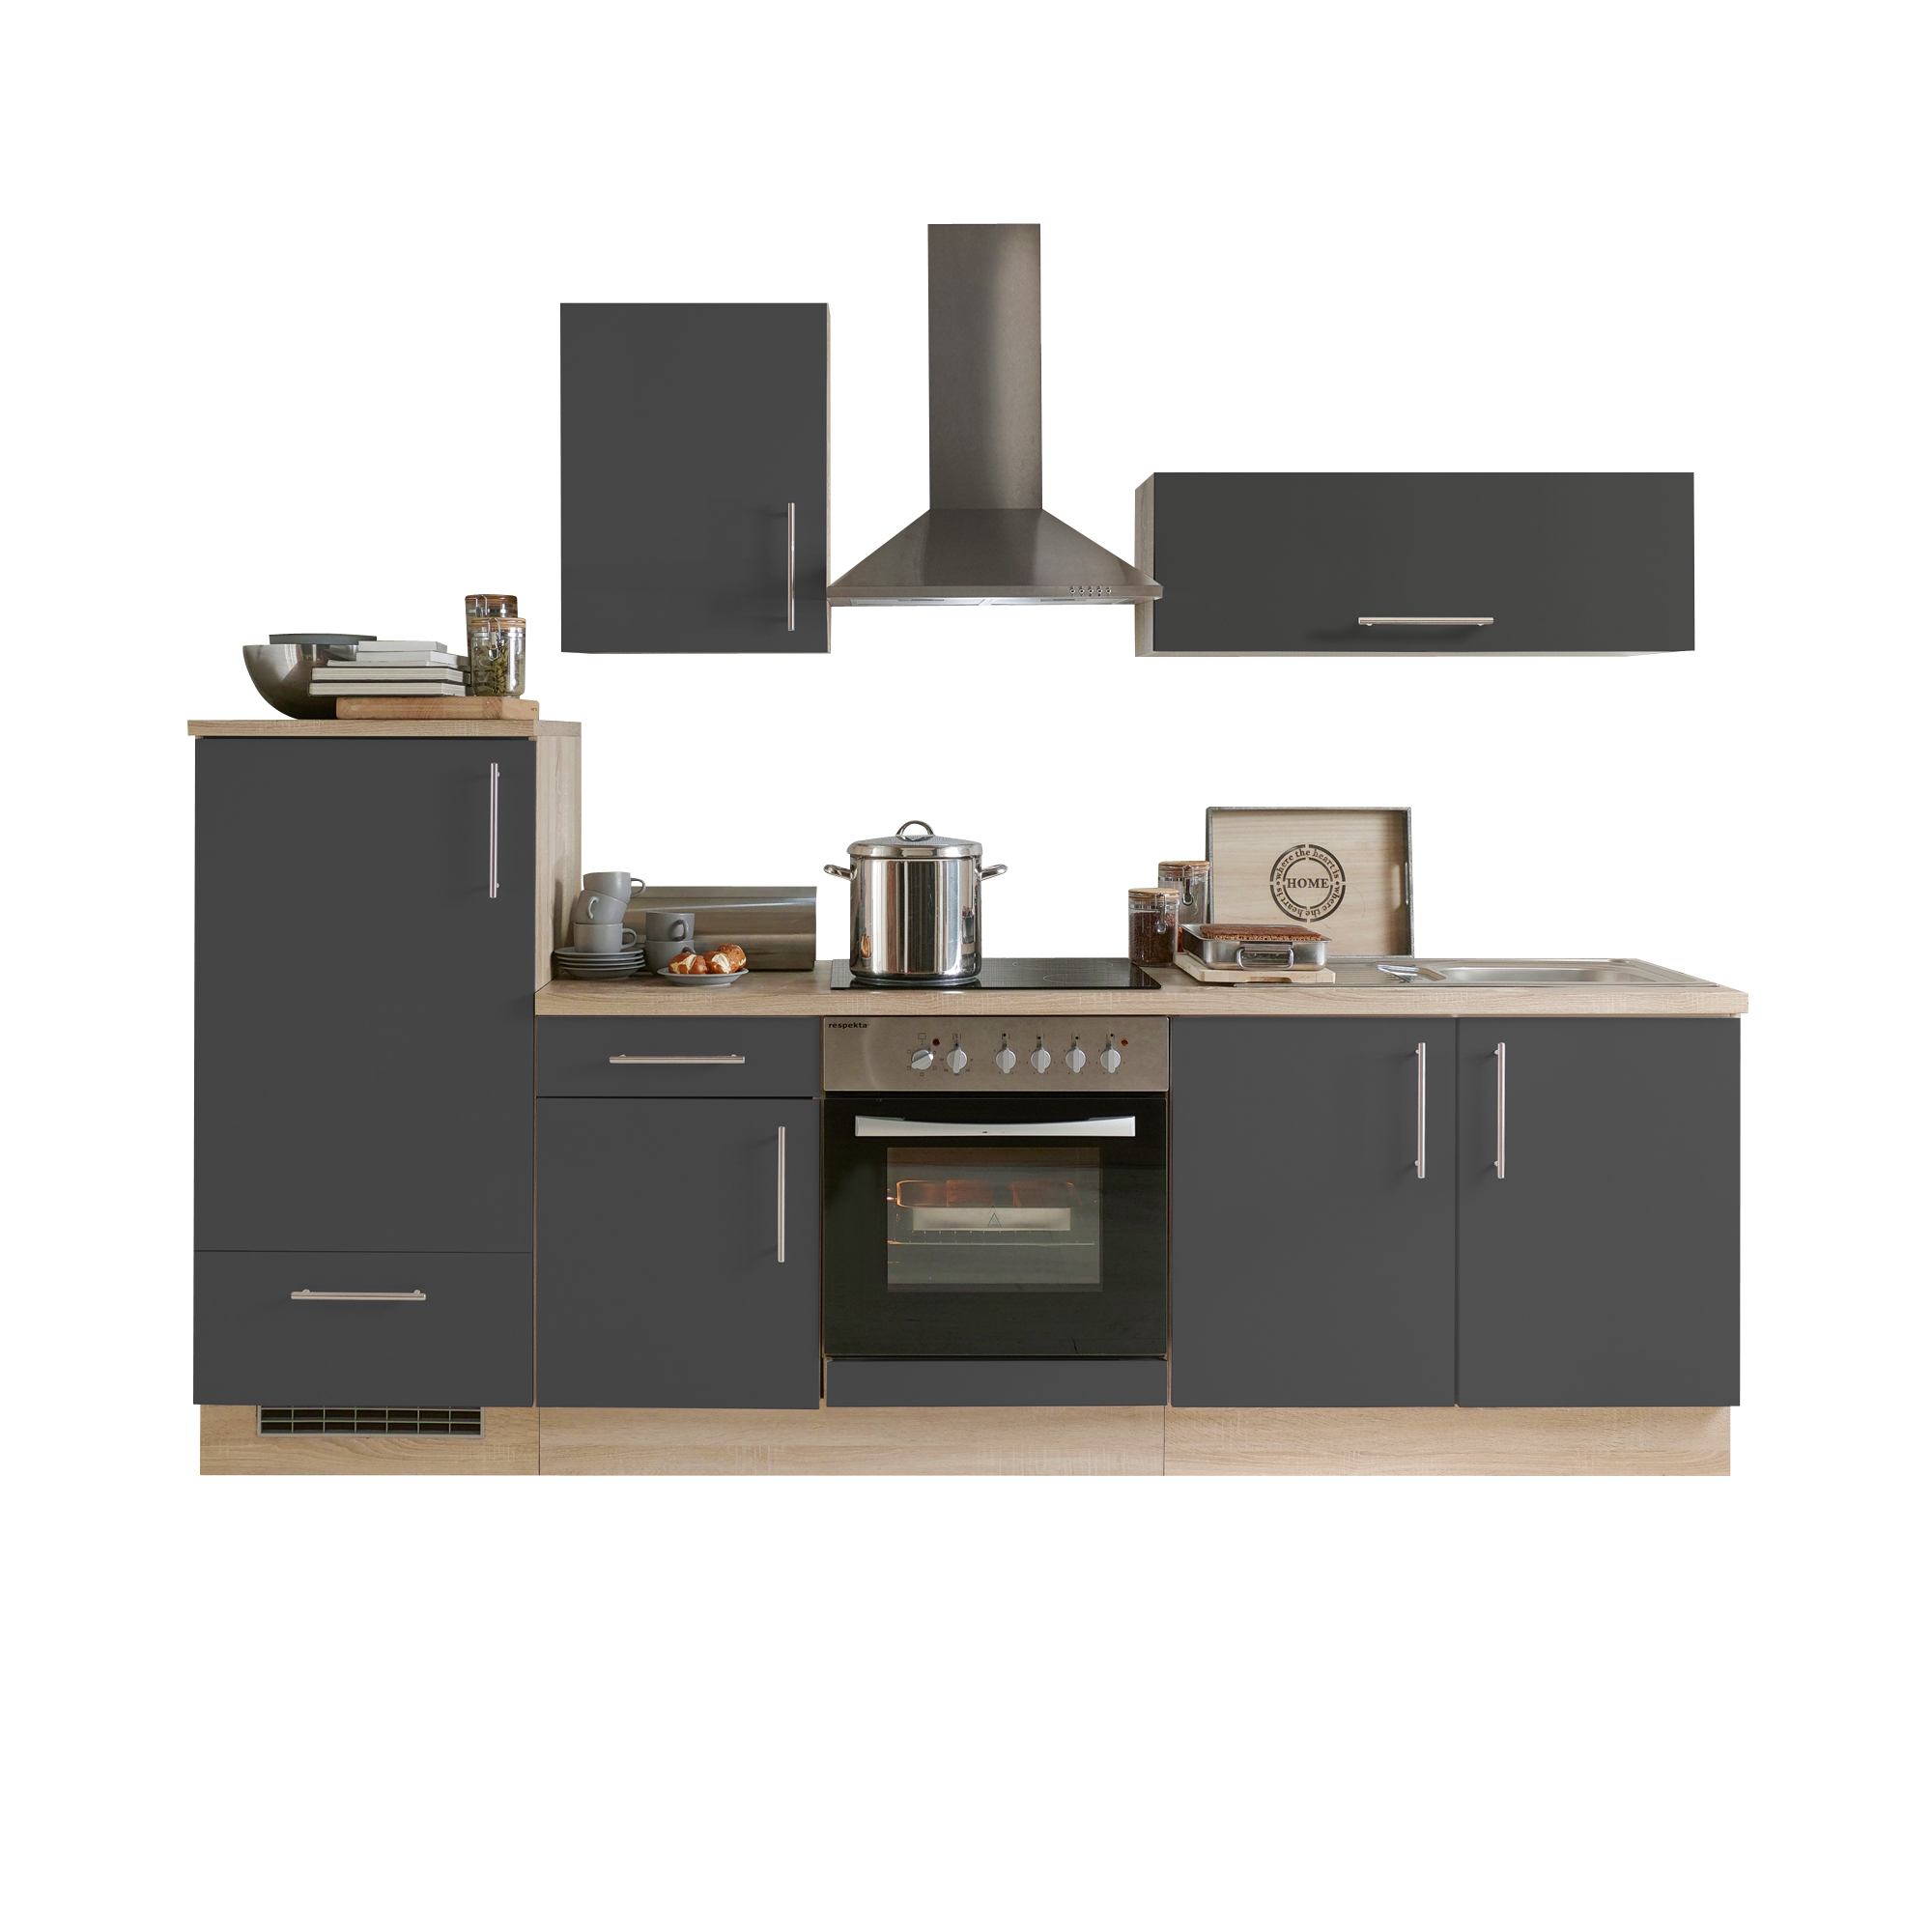 k chenzeile stockholm k che mit e ger ten breite 270. Black Bedroom Furniture Sets. Home Design Ideas